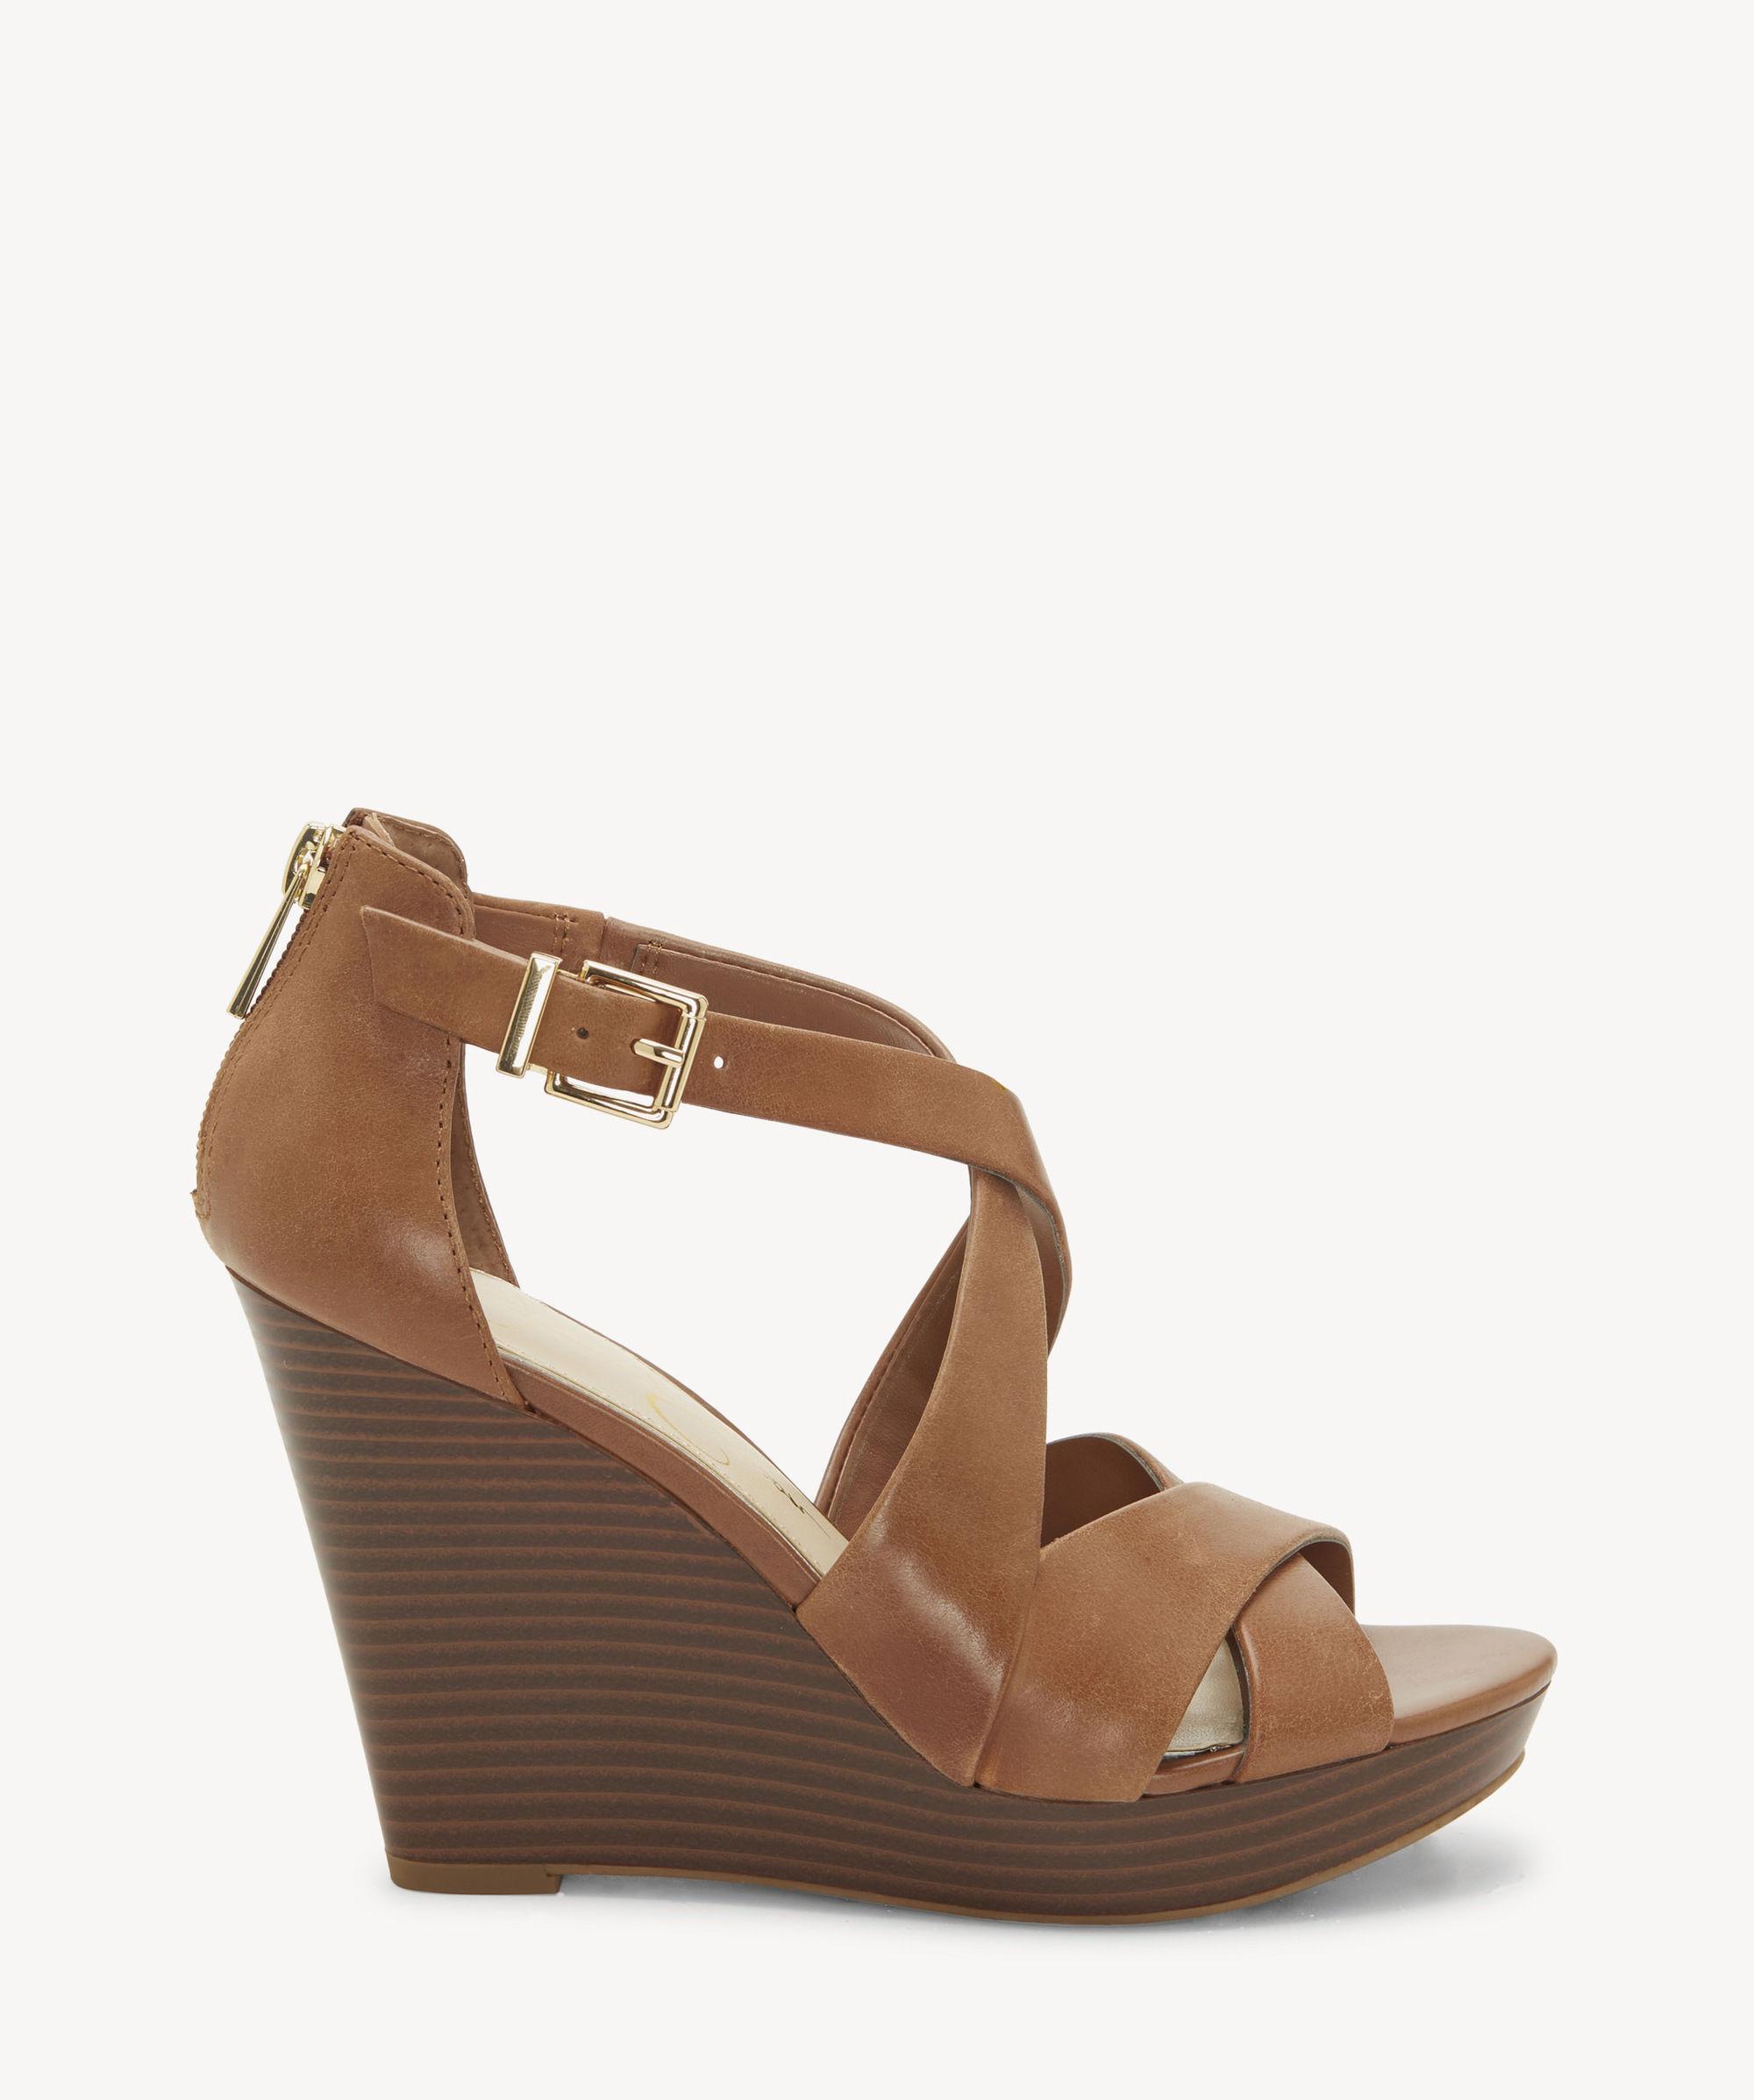 d7ac7b178d9 Lyst - Jessica Simpson Jakayla Platform Wedge Sandal in Brown